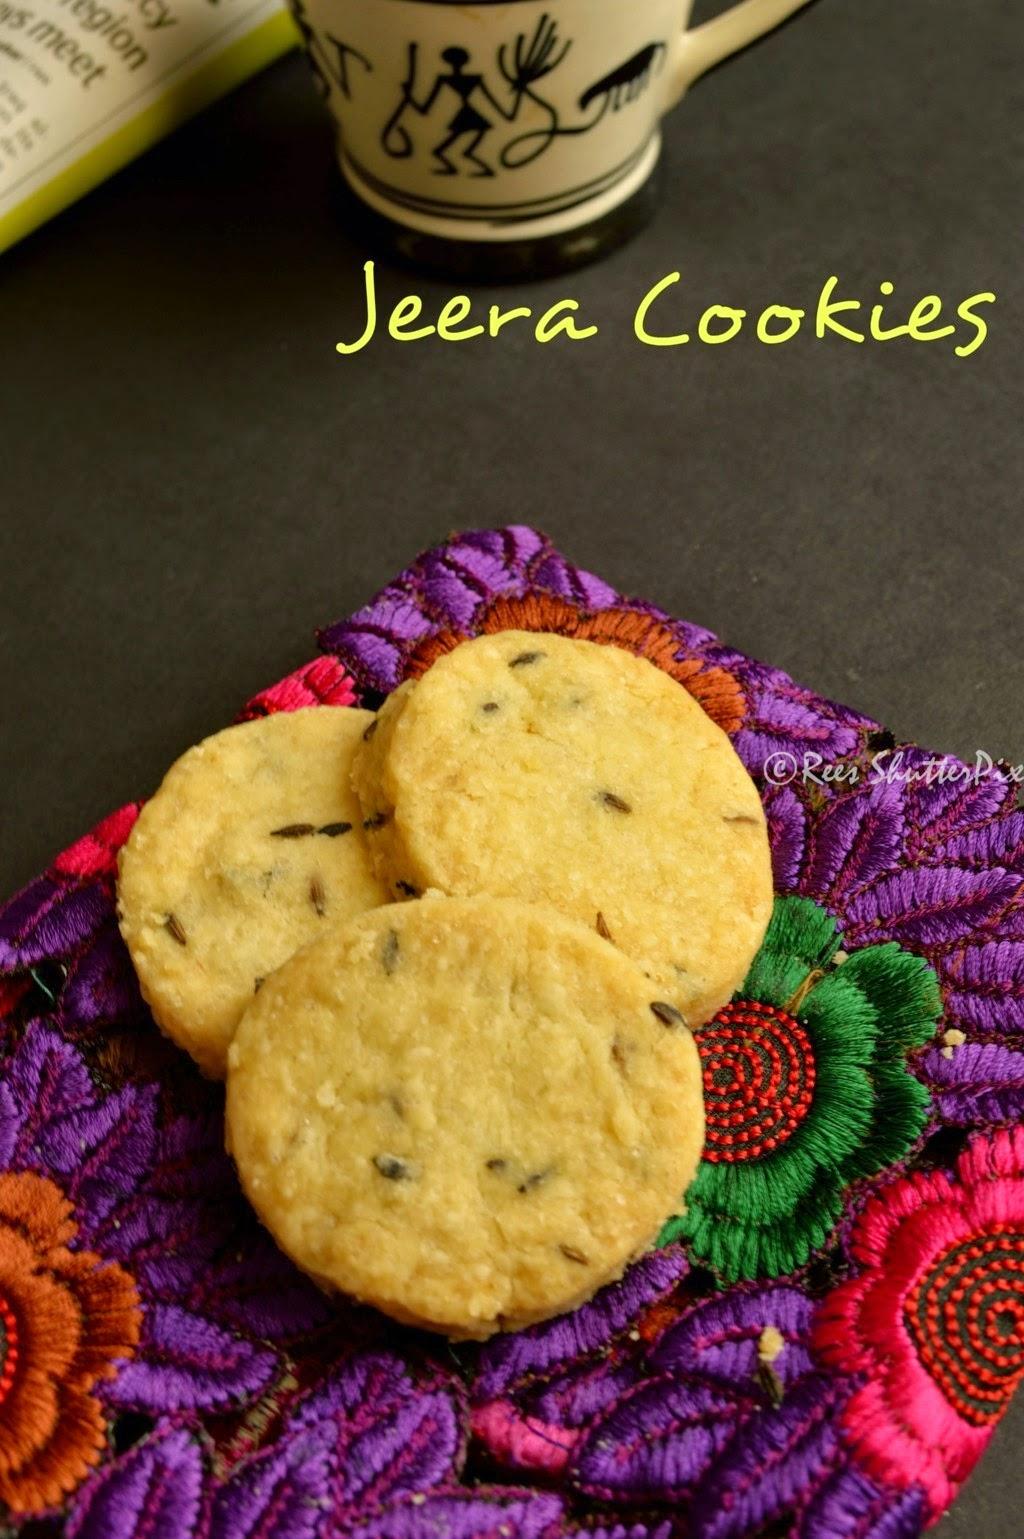 Cumin Cookies Recipe | Jeera Cookies Recipe | Tea Time Snacks,cumin cookies recipe, jeera biscuits recipe, easy cookie recipe, delectable flavours cookies, salt biscuits recipes, easy cookie recipe, how to make cumin cookies, jeera cookies at home, eggless cookies,eggless jeera cookies